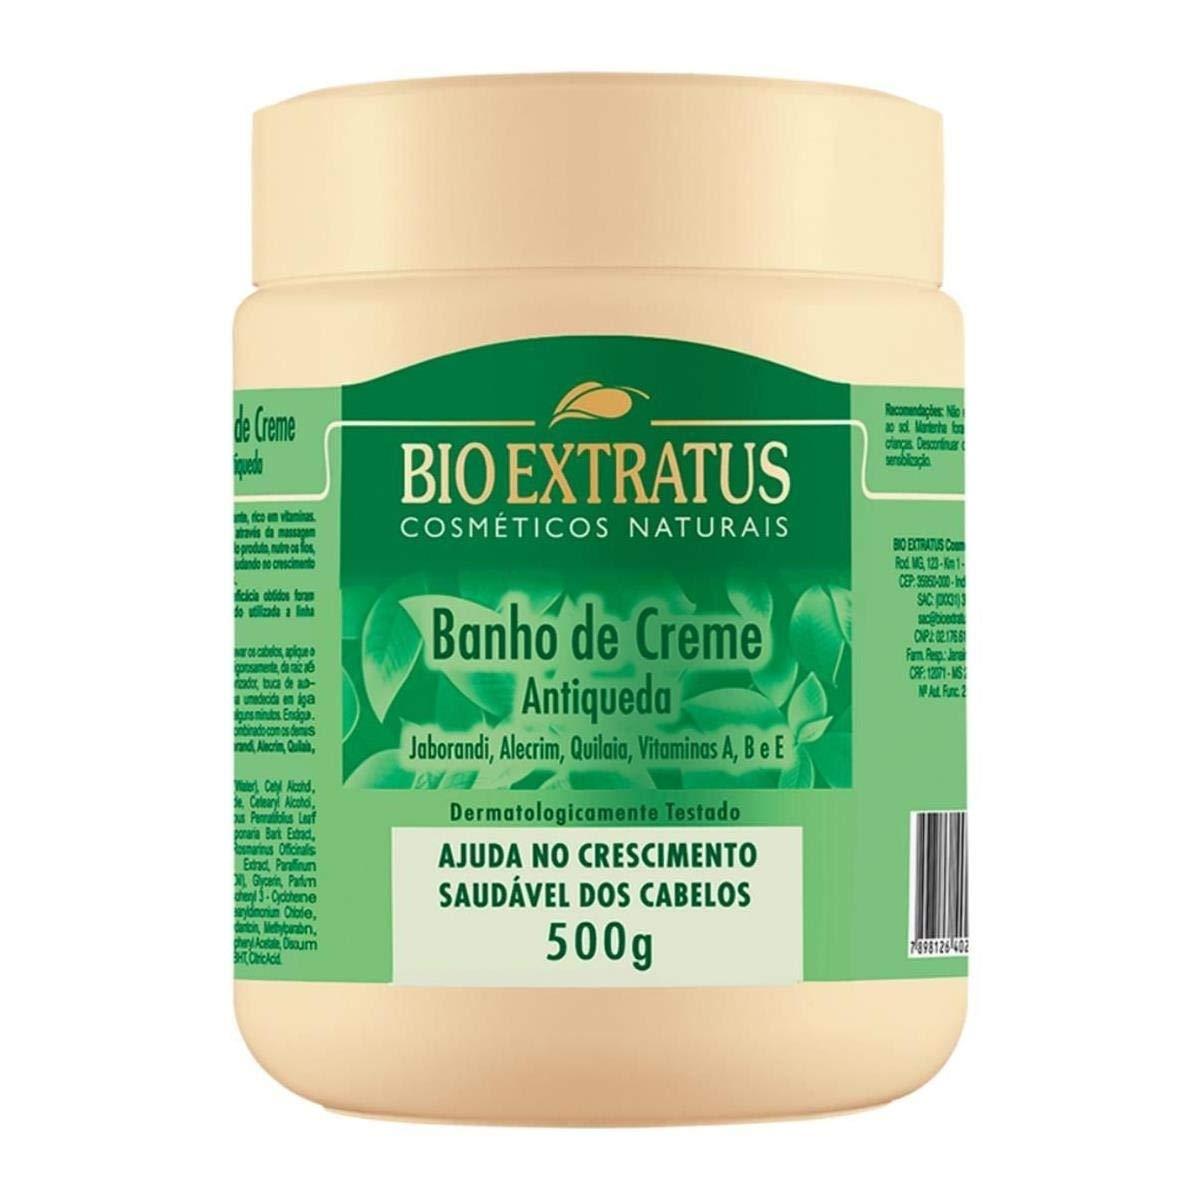 Linha Jaborandi Bio Extratus - Banho All items free shipping Hidratacao de Creme All items free shipping Antique